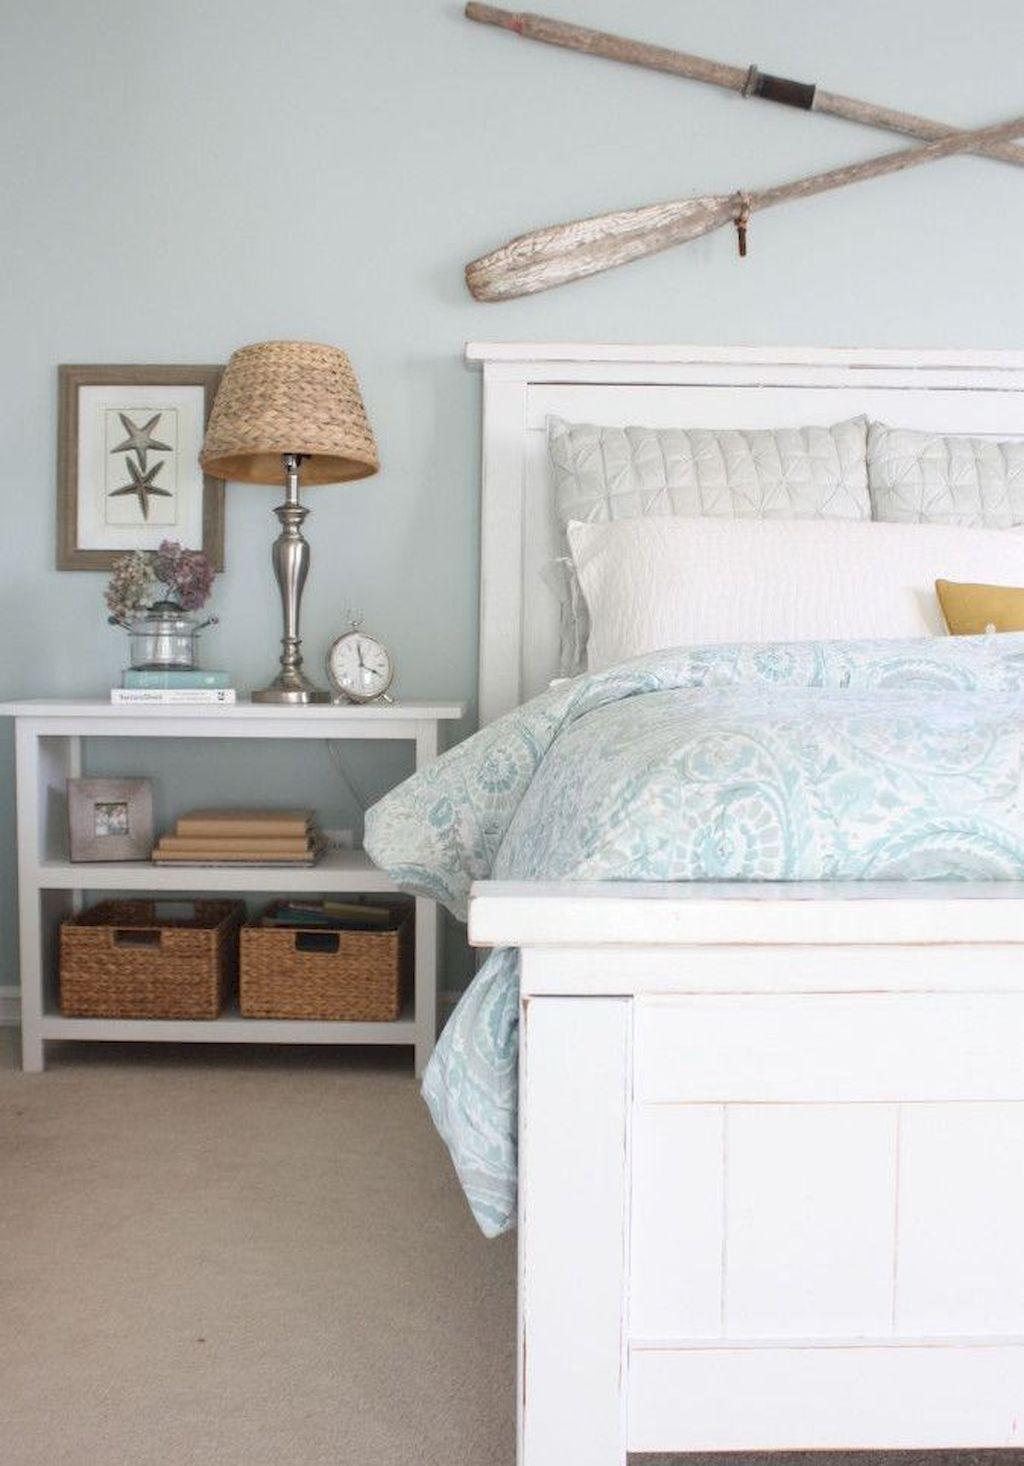 30 Cool Beach Bedroom Design Ideas Beach Bedroom Cool Design Coastal Master Bedroom Master Bedrooms Decor Coastal Bedrooms